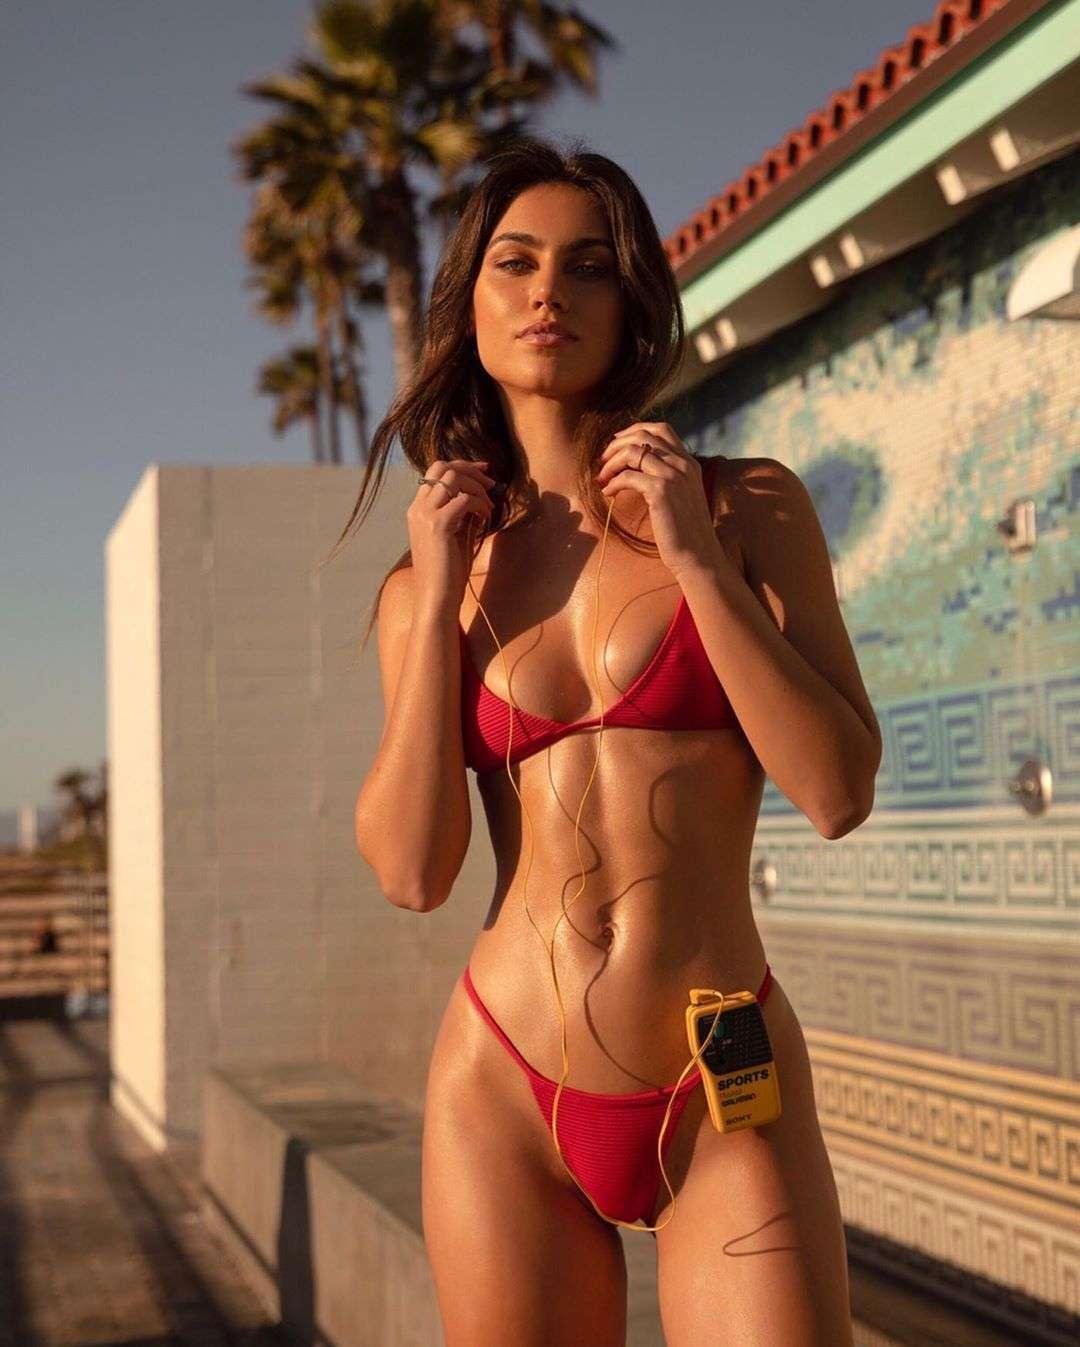 Steph Rayner nude & sexy